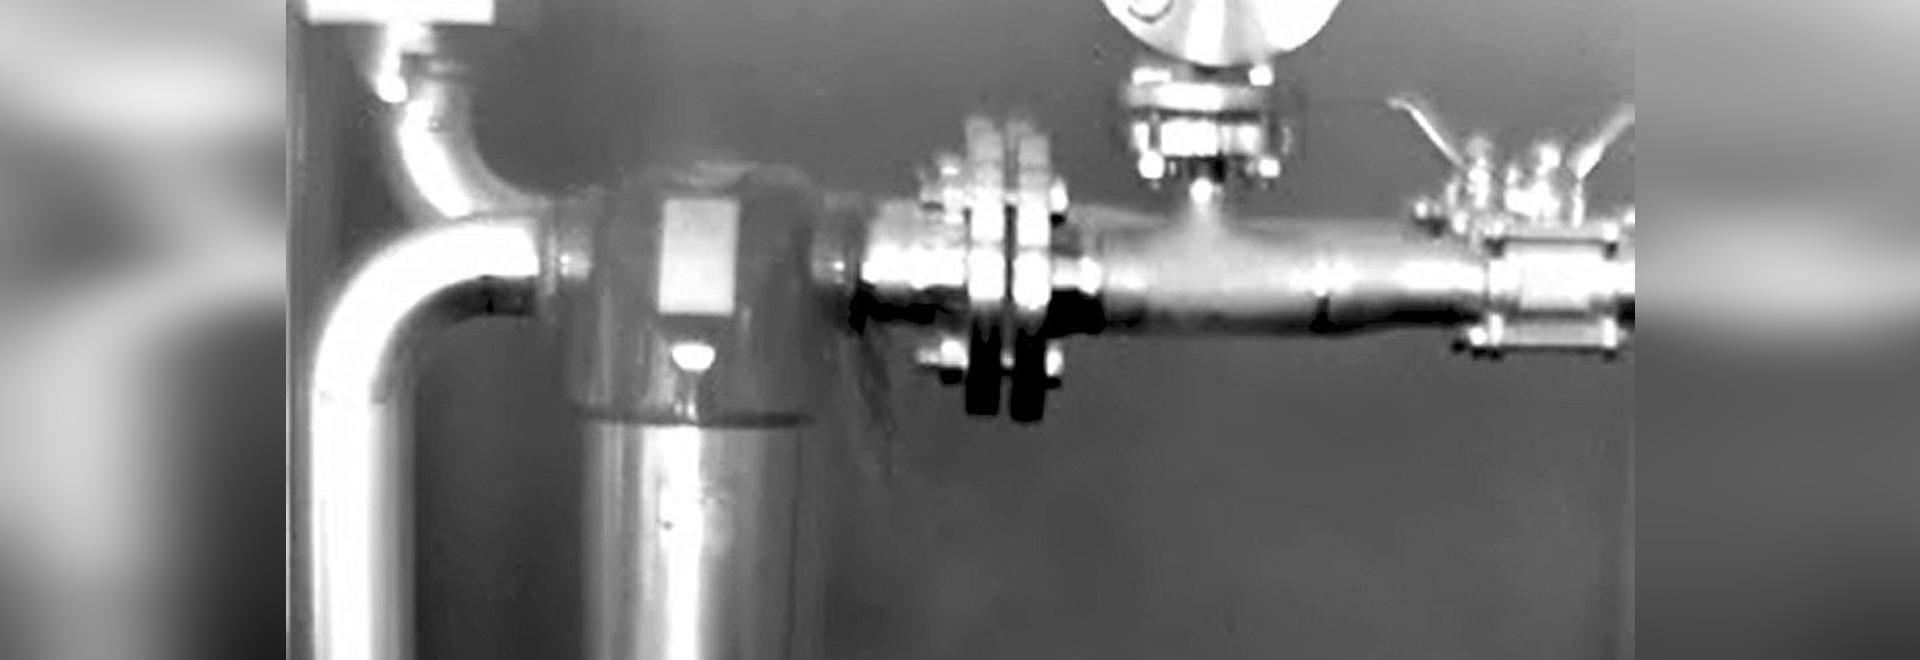 FLIR GF343 ermittelt Hard-to-find Kohlendioxyd-Lecks